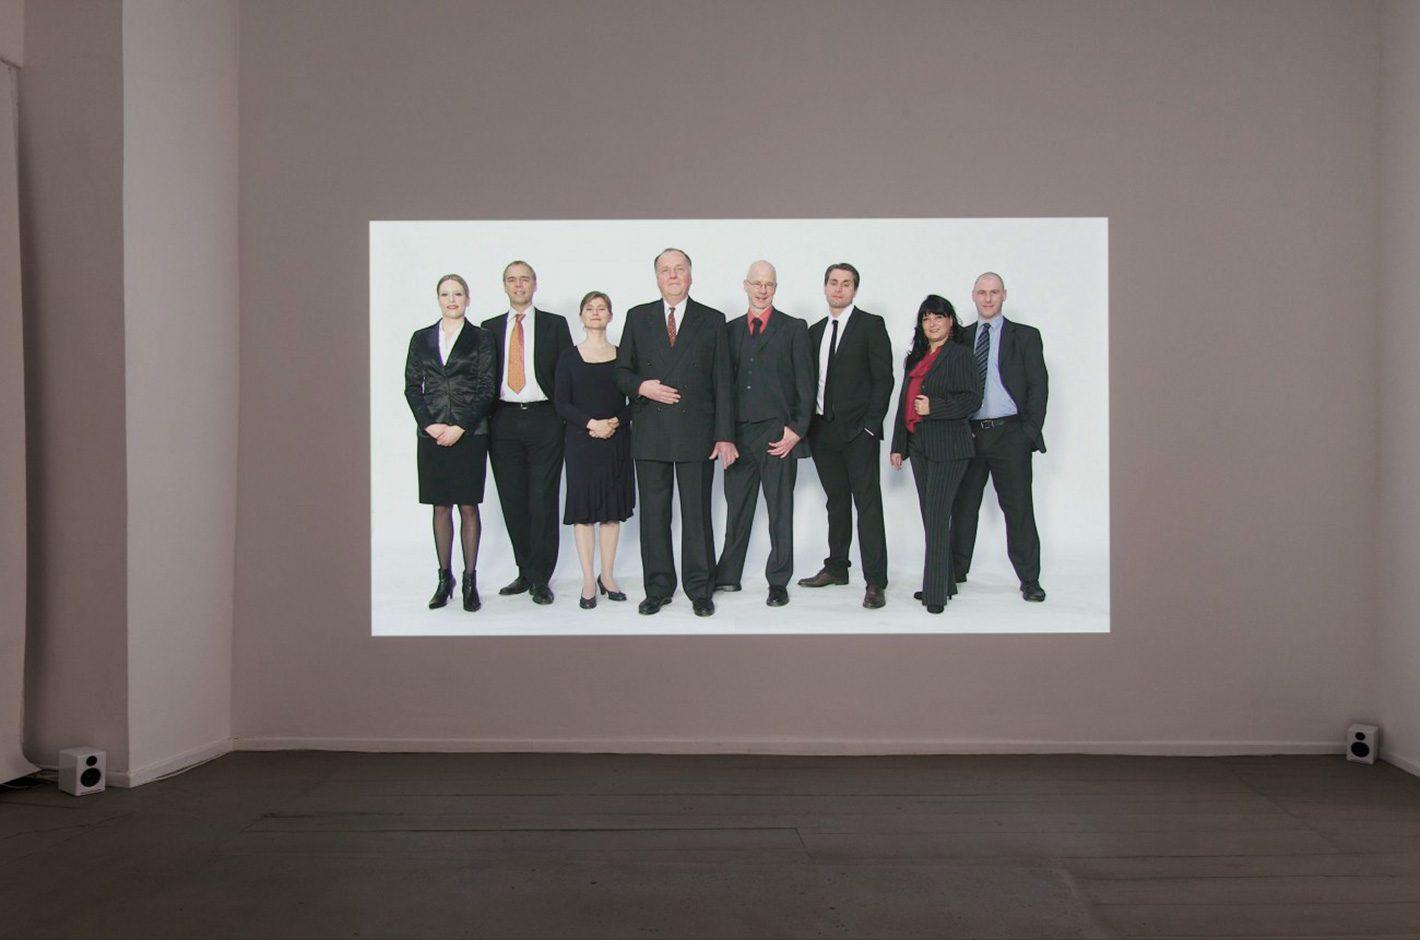 Anna Witt: Public Emotions, 2014